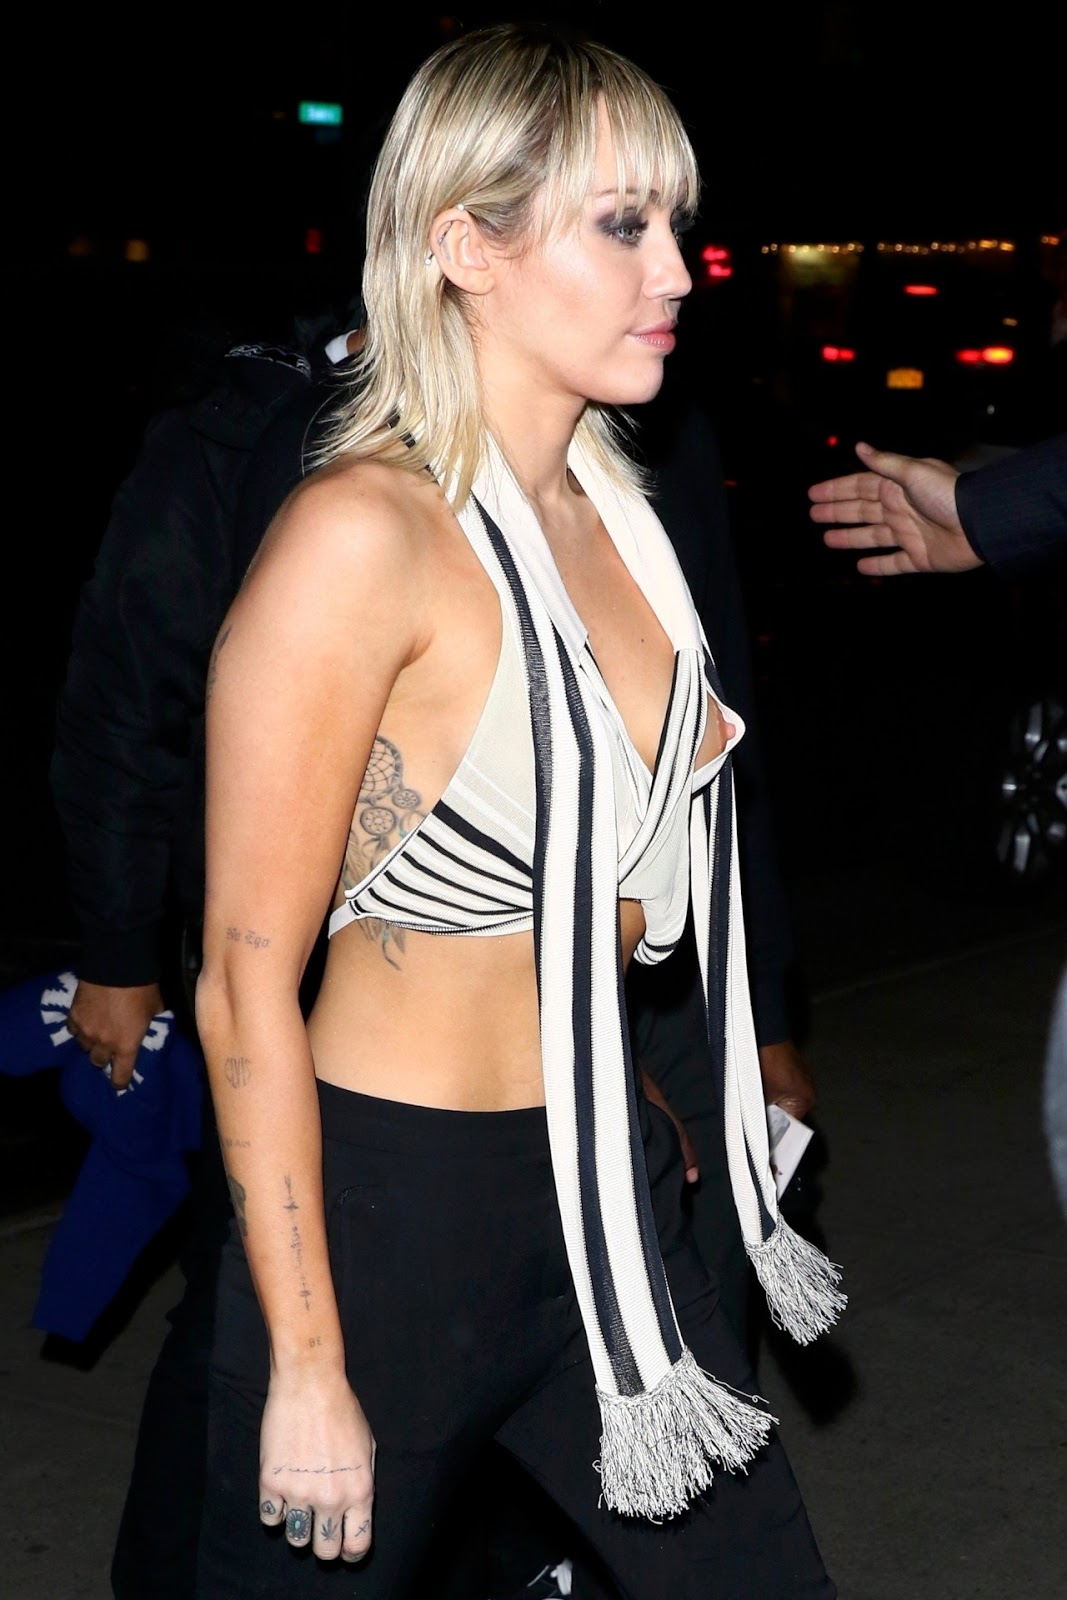 Miley Cyrus Shares NSFW Nip Slip Wardrobe Malfunction Photo